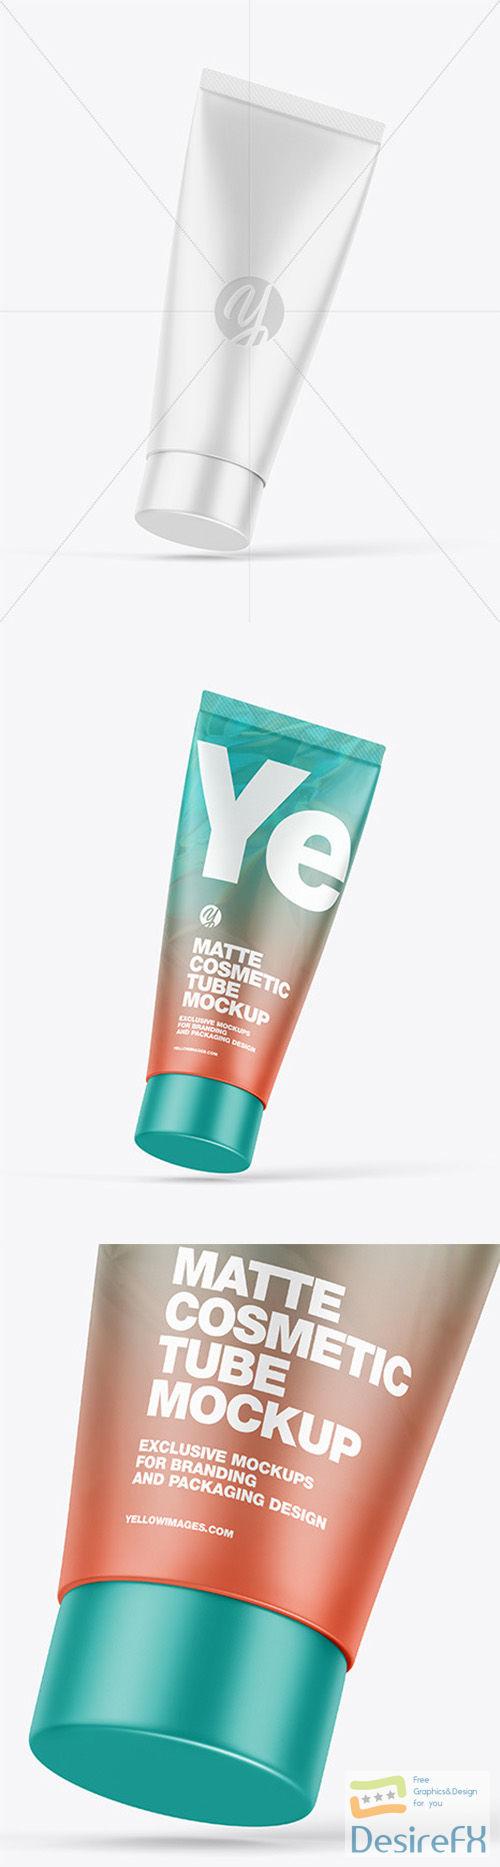 Matte Cosmetic Tube Mockup 66397